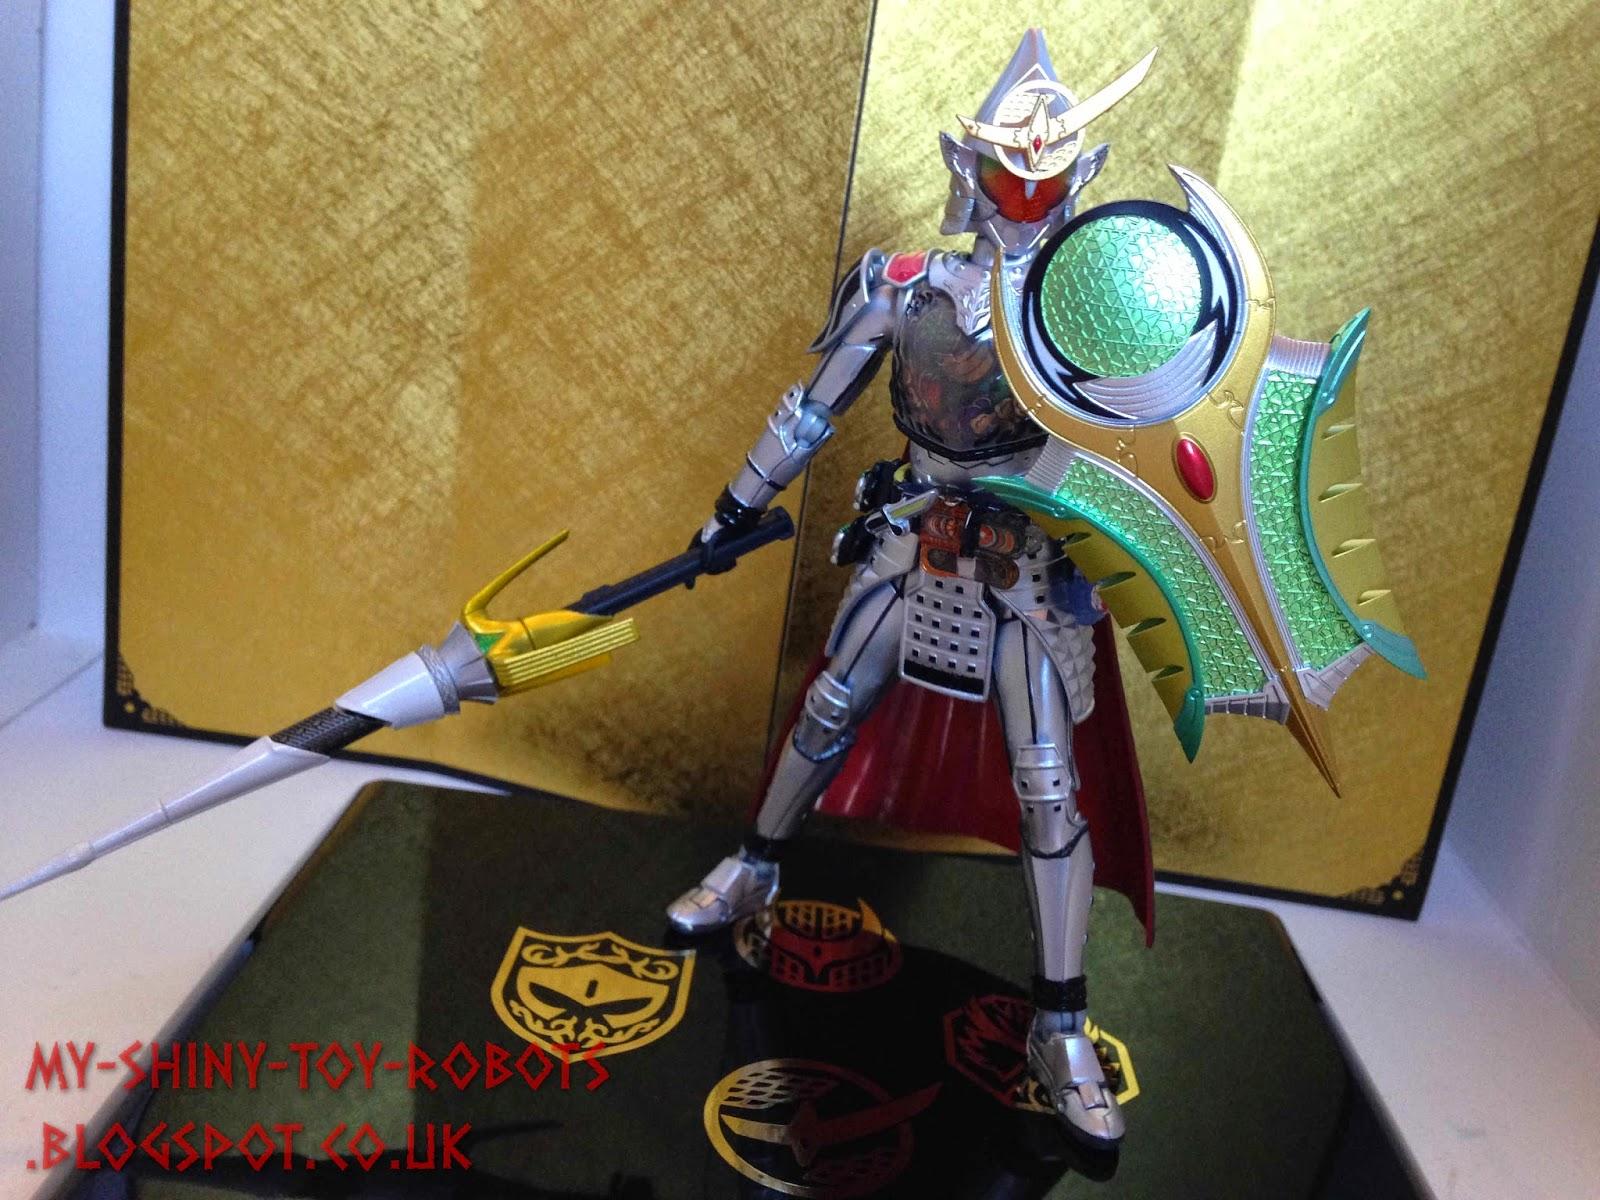 Banaspear + Melon Defender